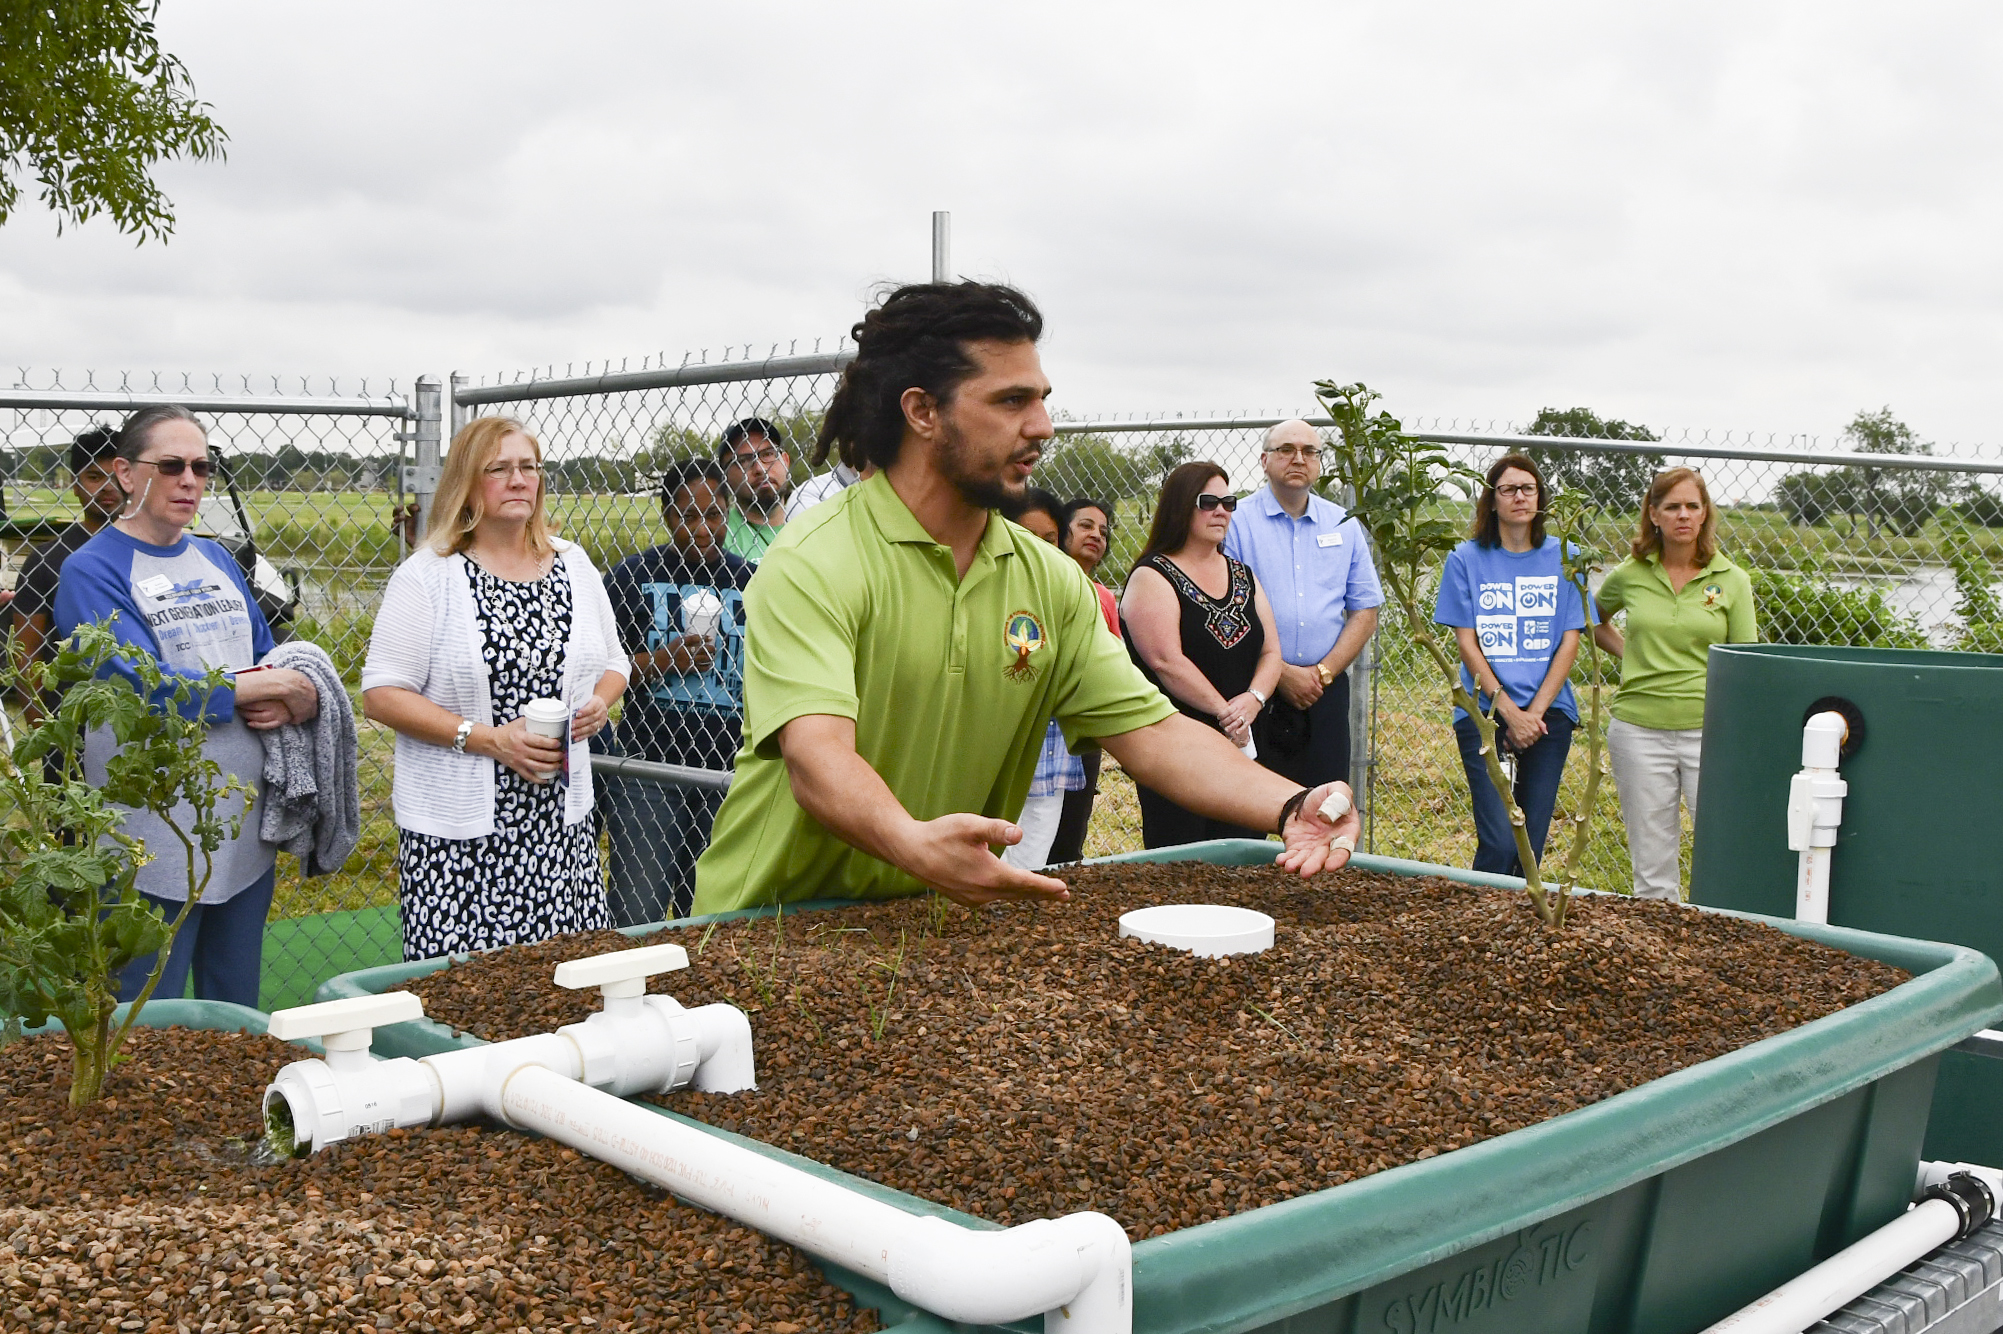 Dr. Bradley Borougerdi shows off the new hydroponics garden